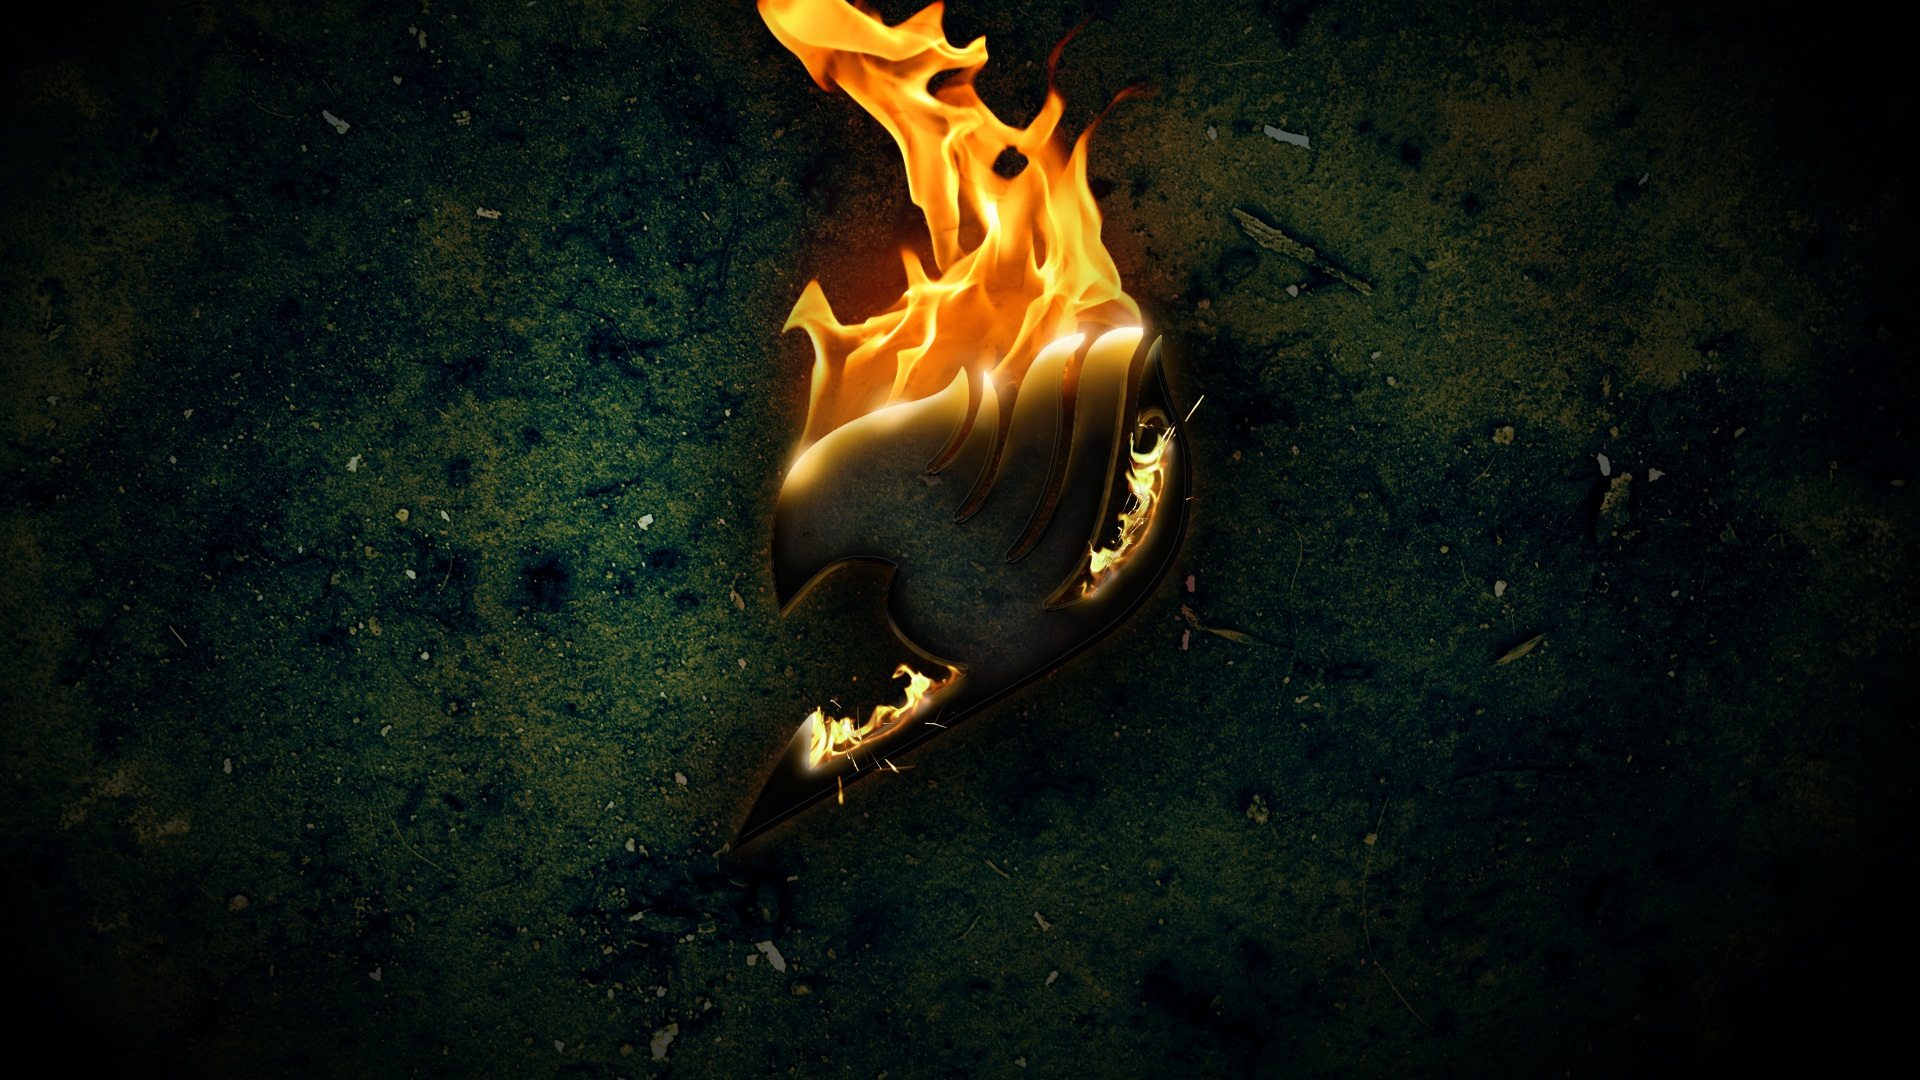 Fairy Tail Logo on Fire Wallpaper | Fairy Tail | Pinterest | Logos